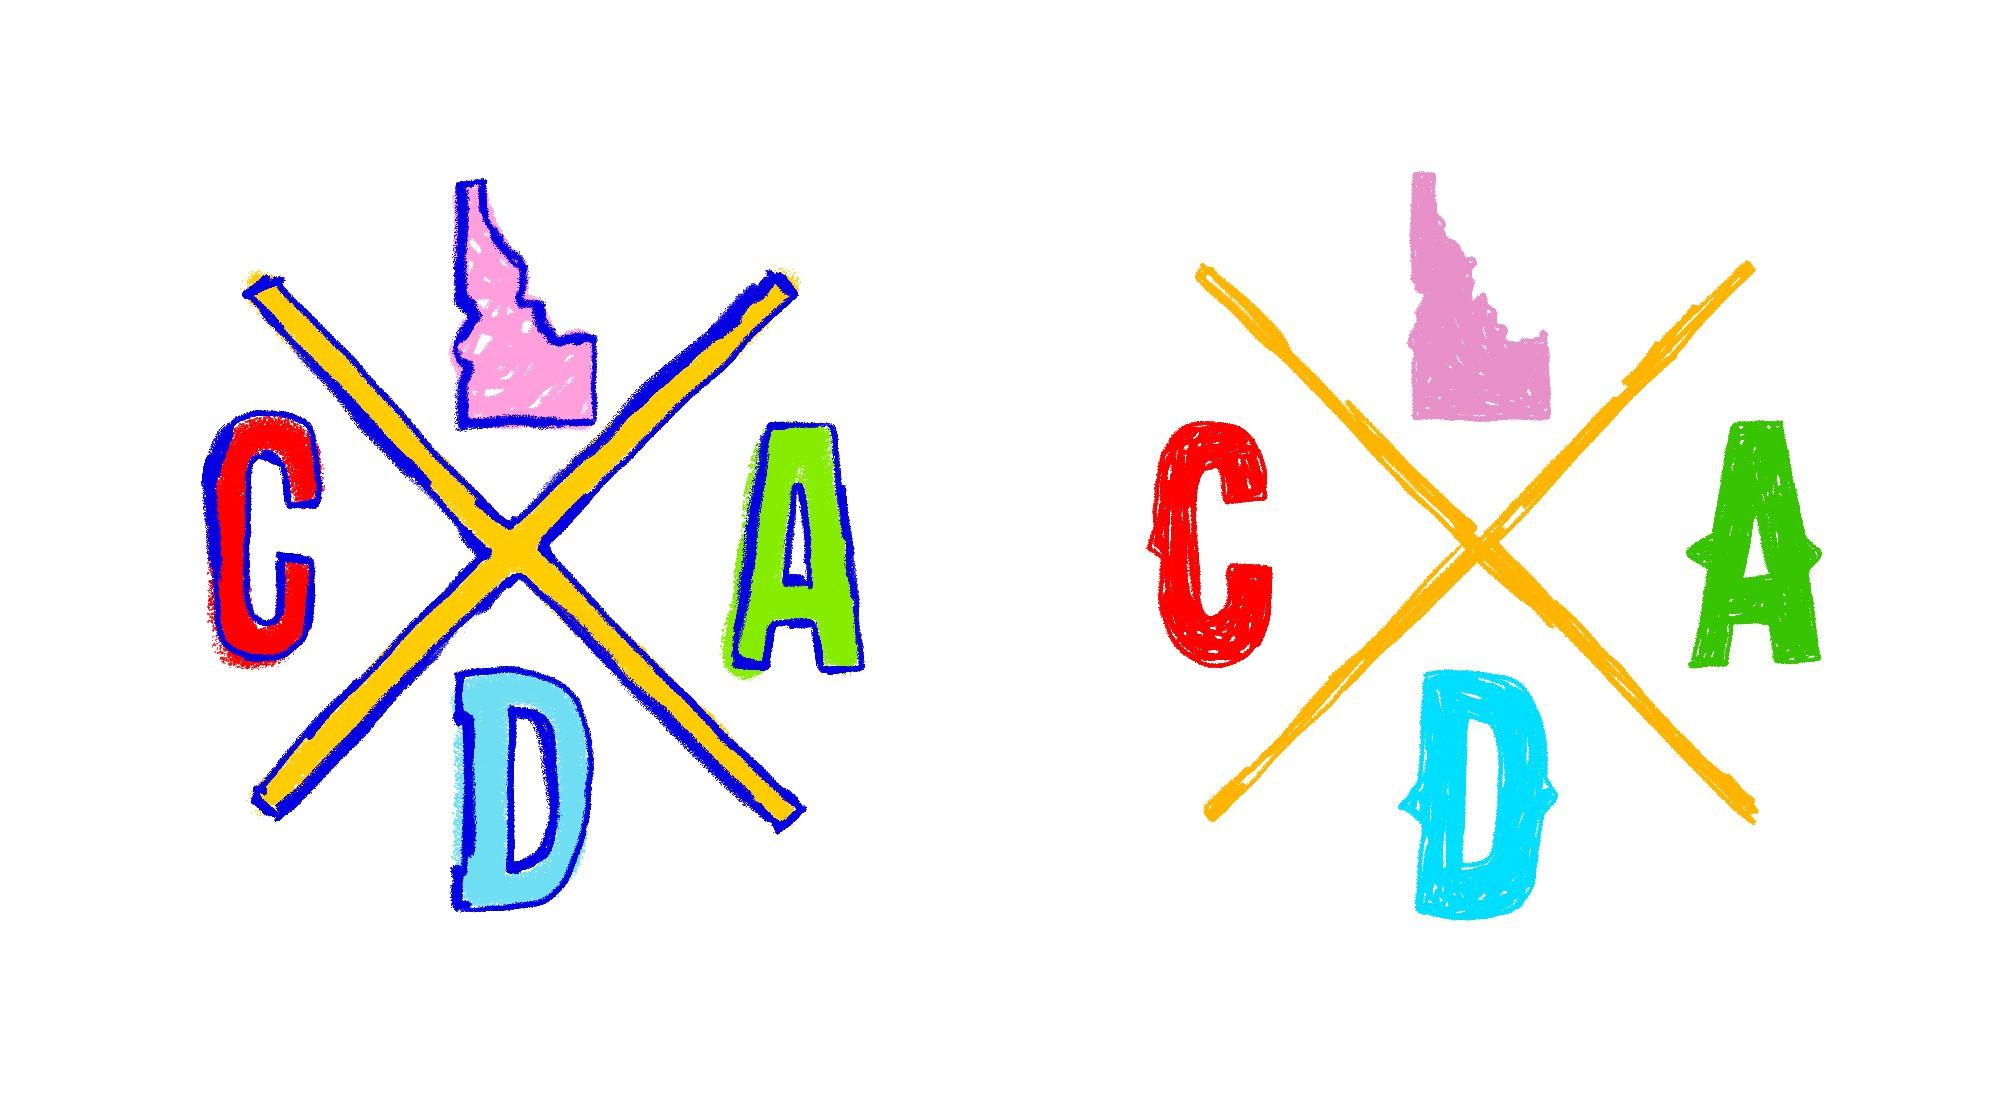 Crayon / Kids version of our CDA IDAHO Logo